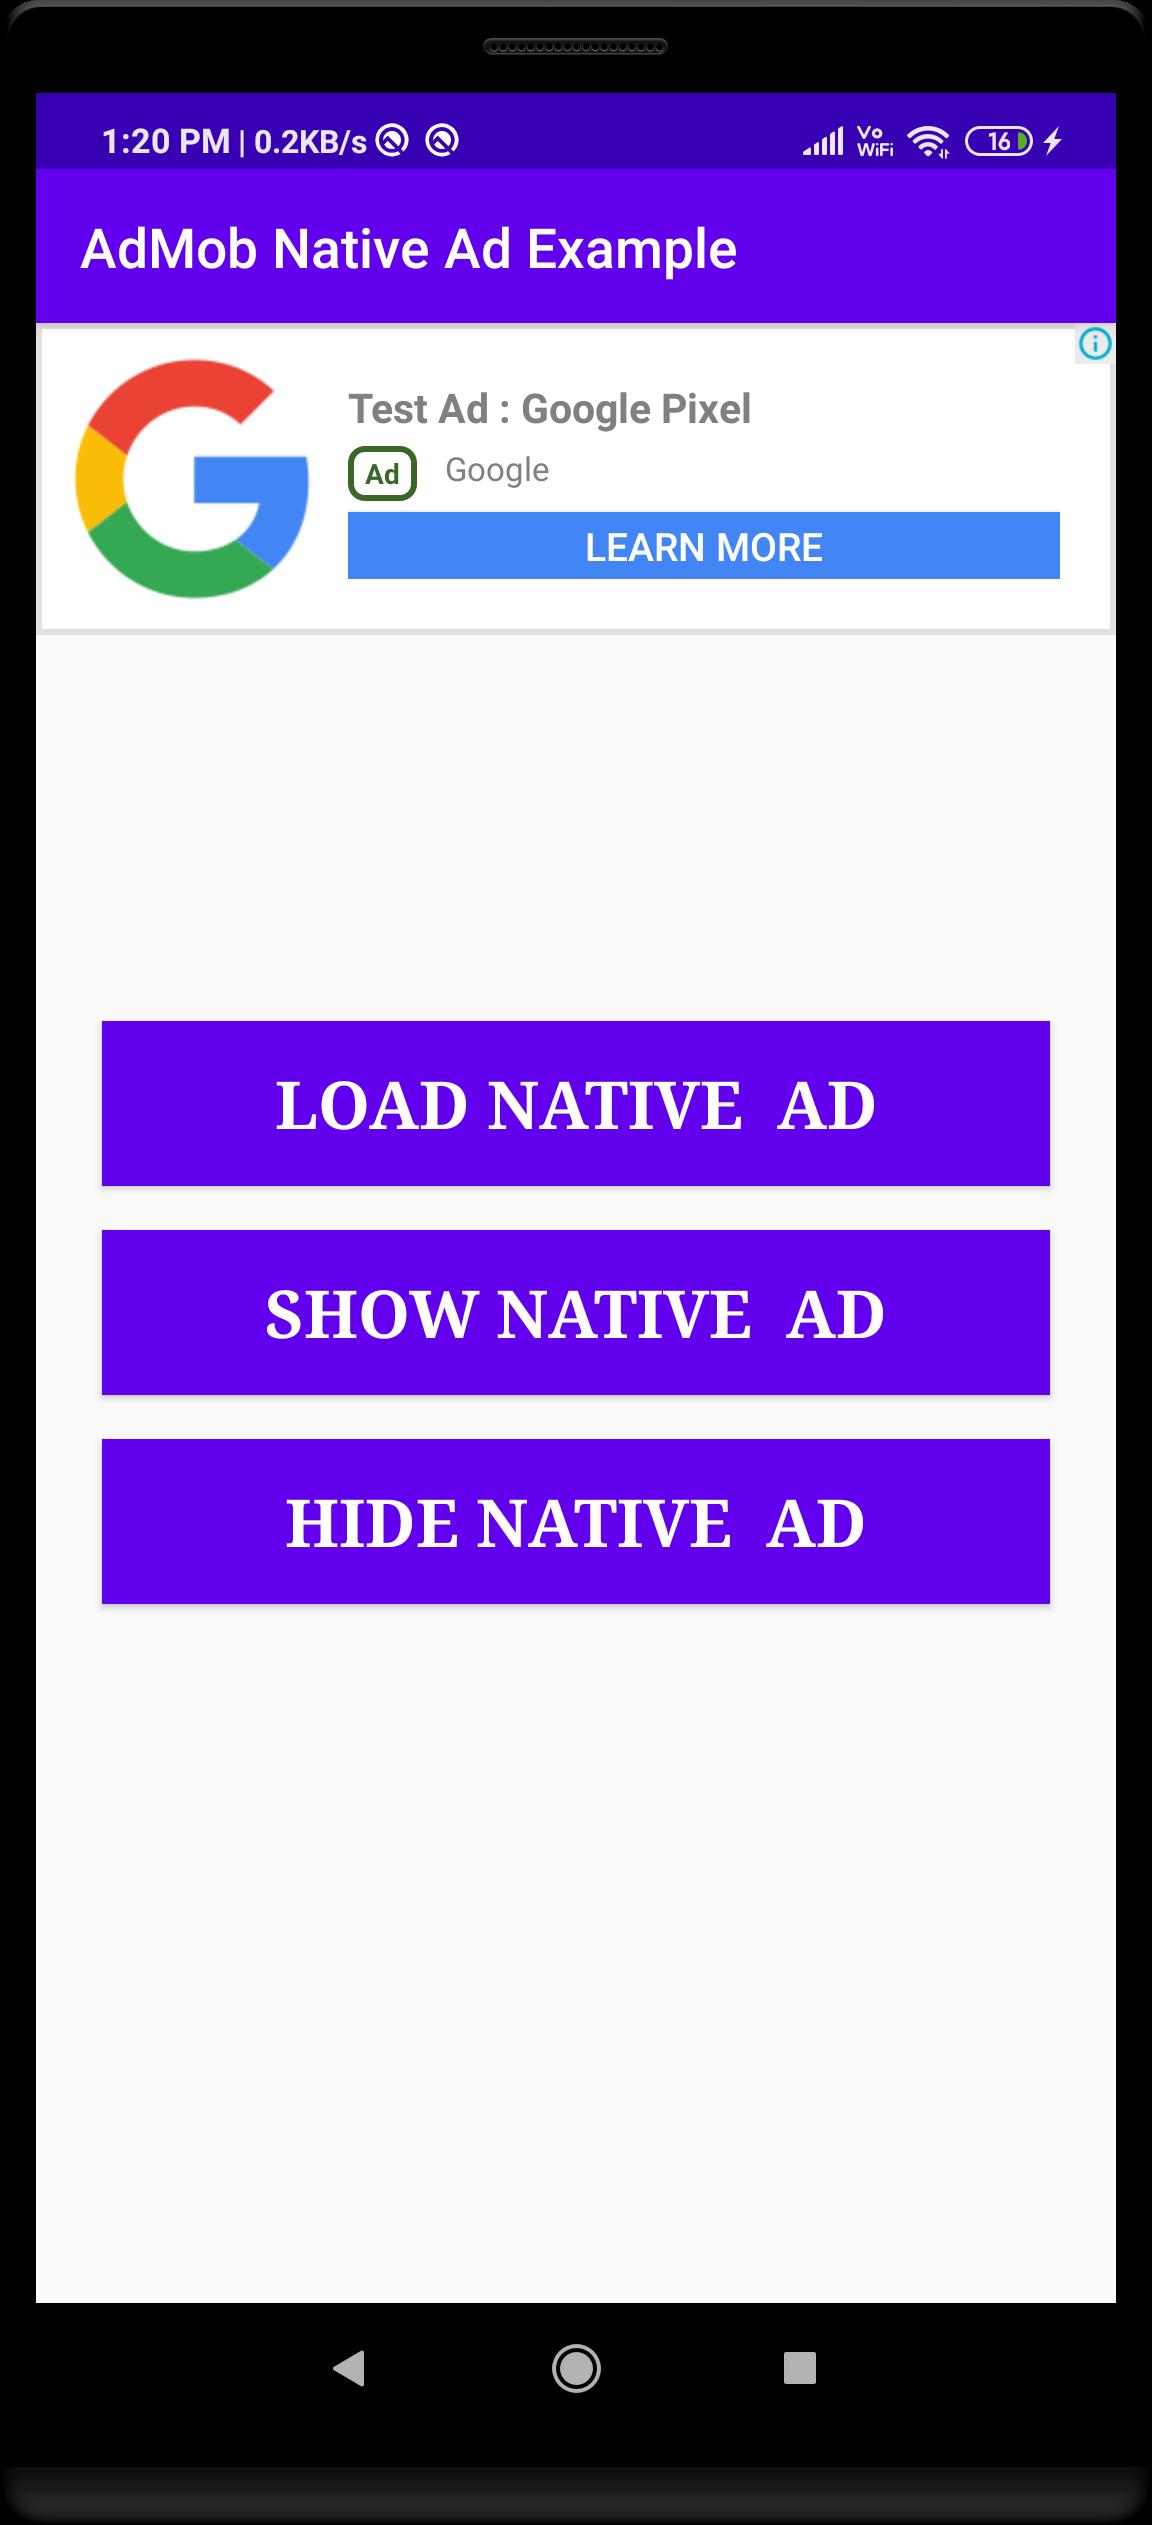 admob native ad example